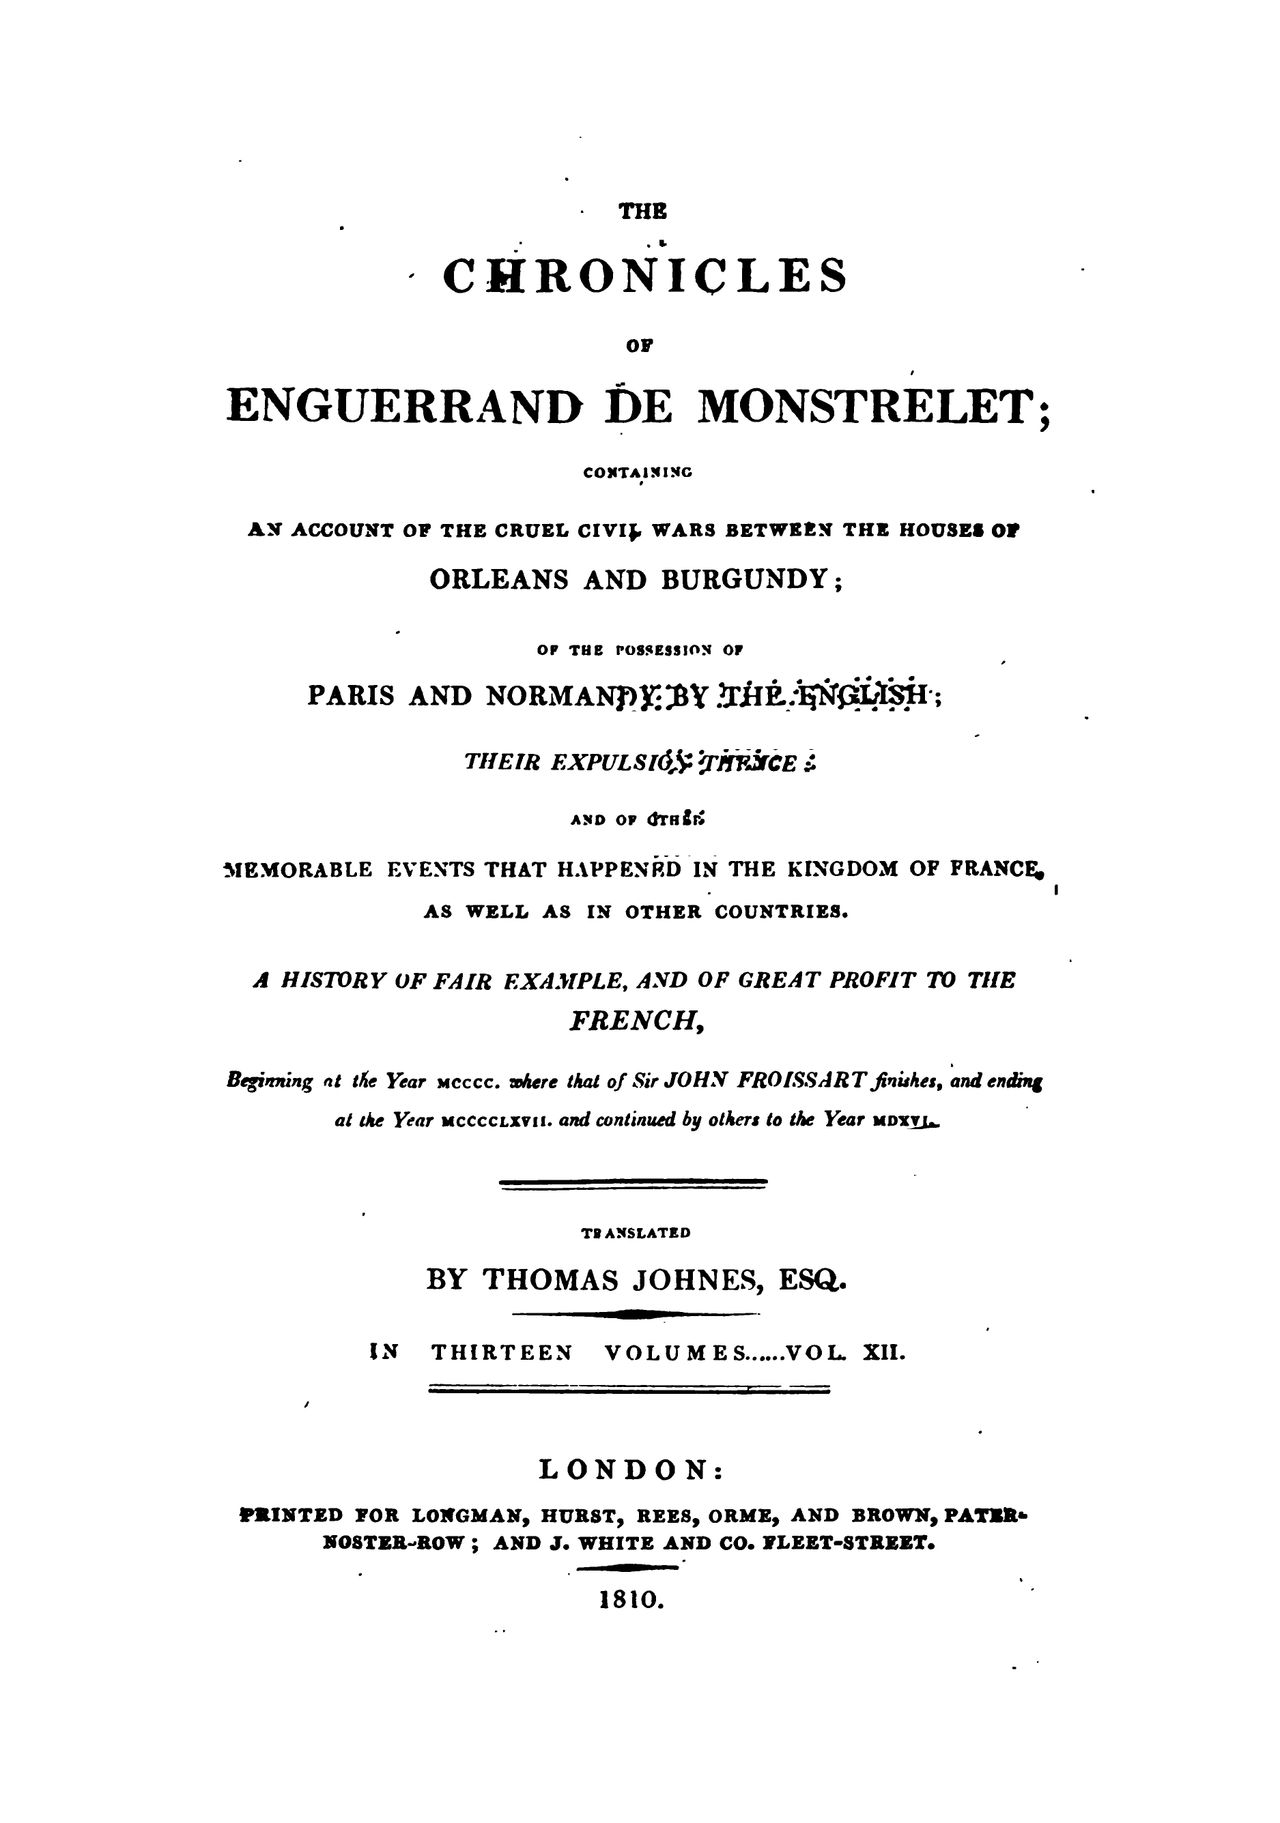 Enguerrand de Monstrelet chronicle vol.12